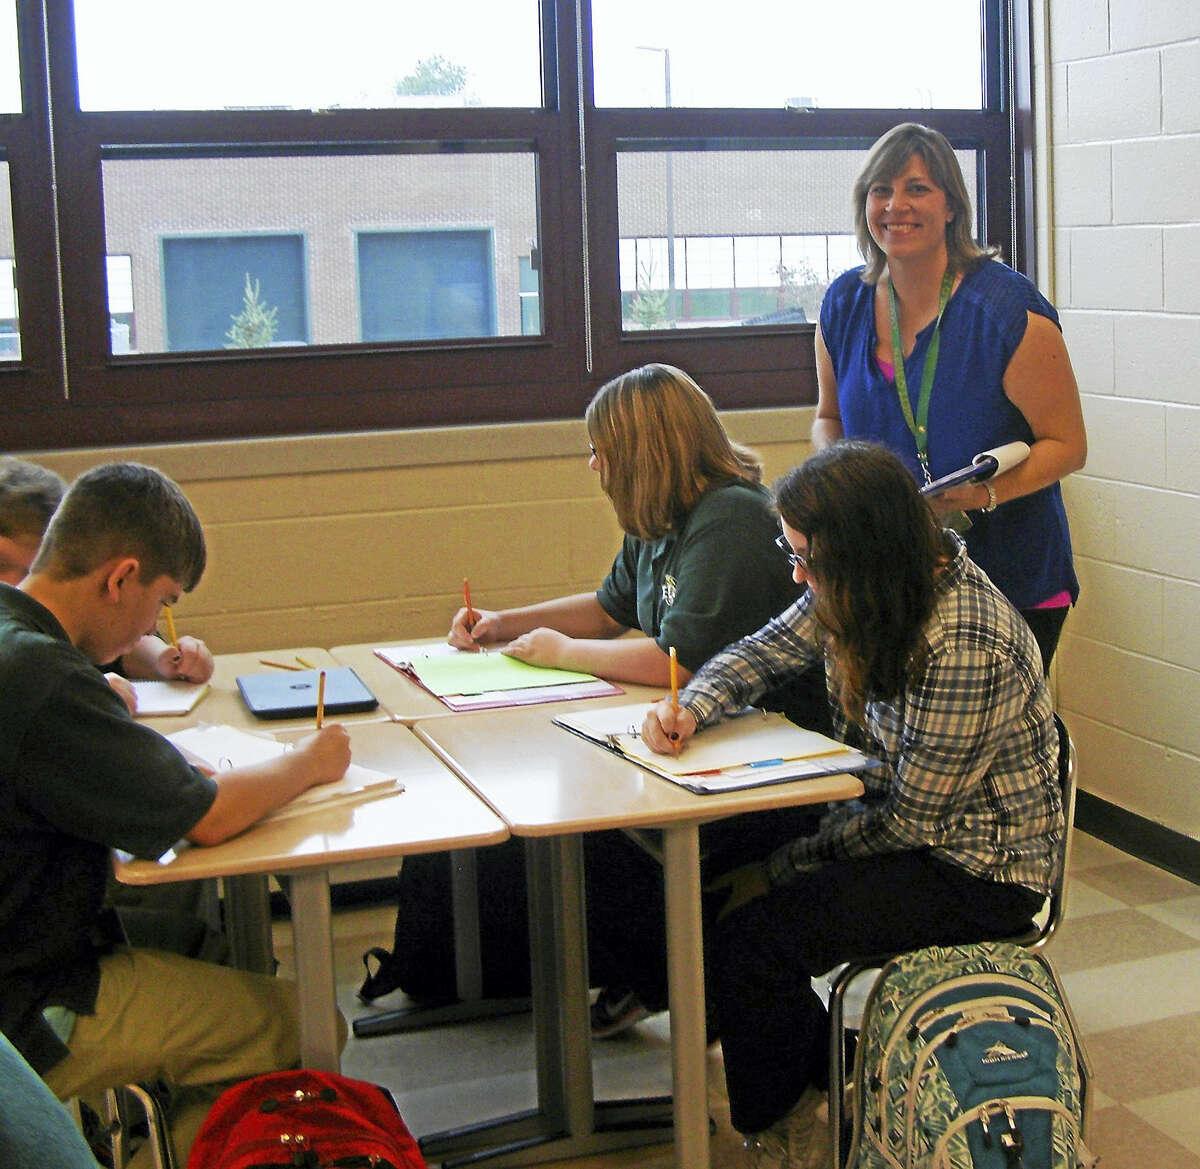 Kimberly Adams in her classroom.